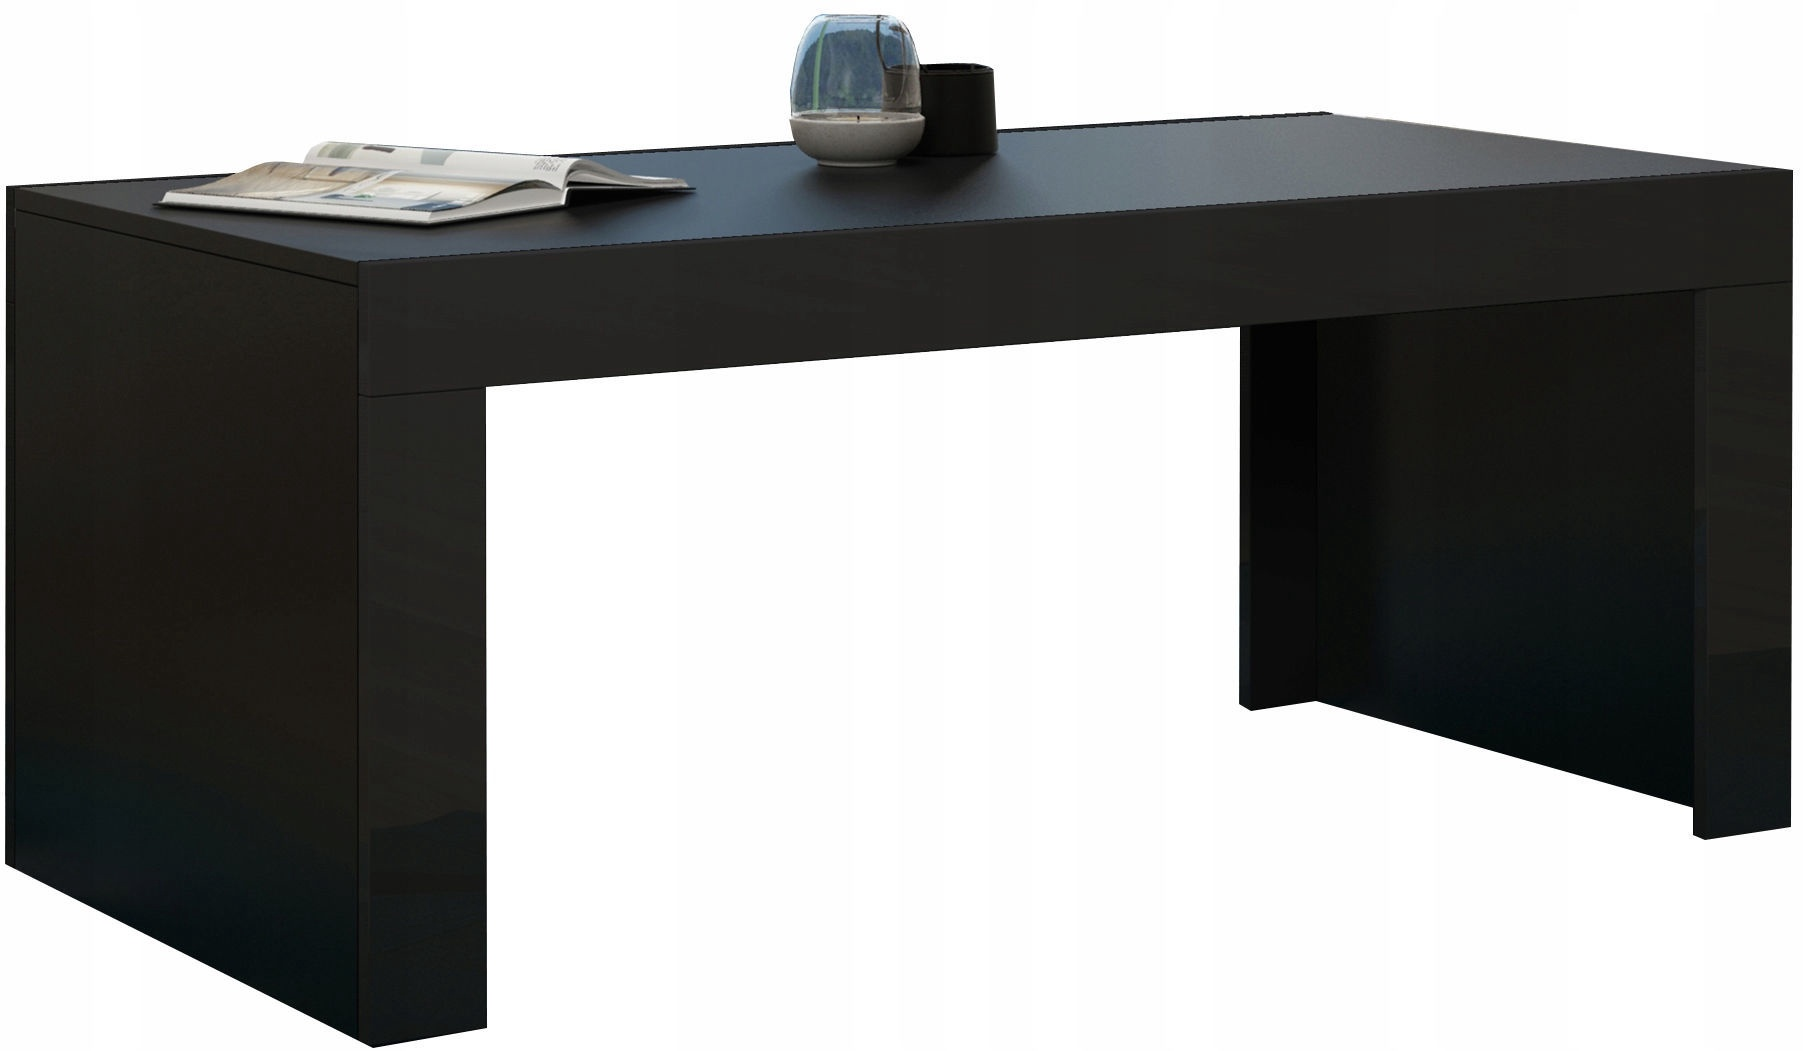 Coffee Table Desk.Pro Meble Coffee Table Milano Black